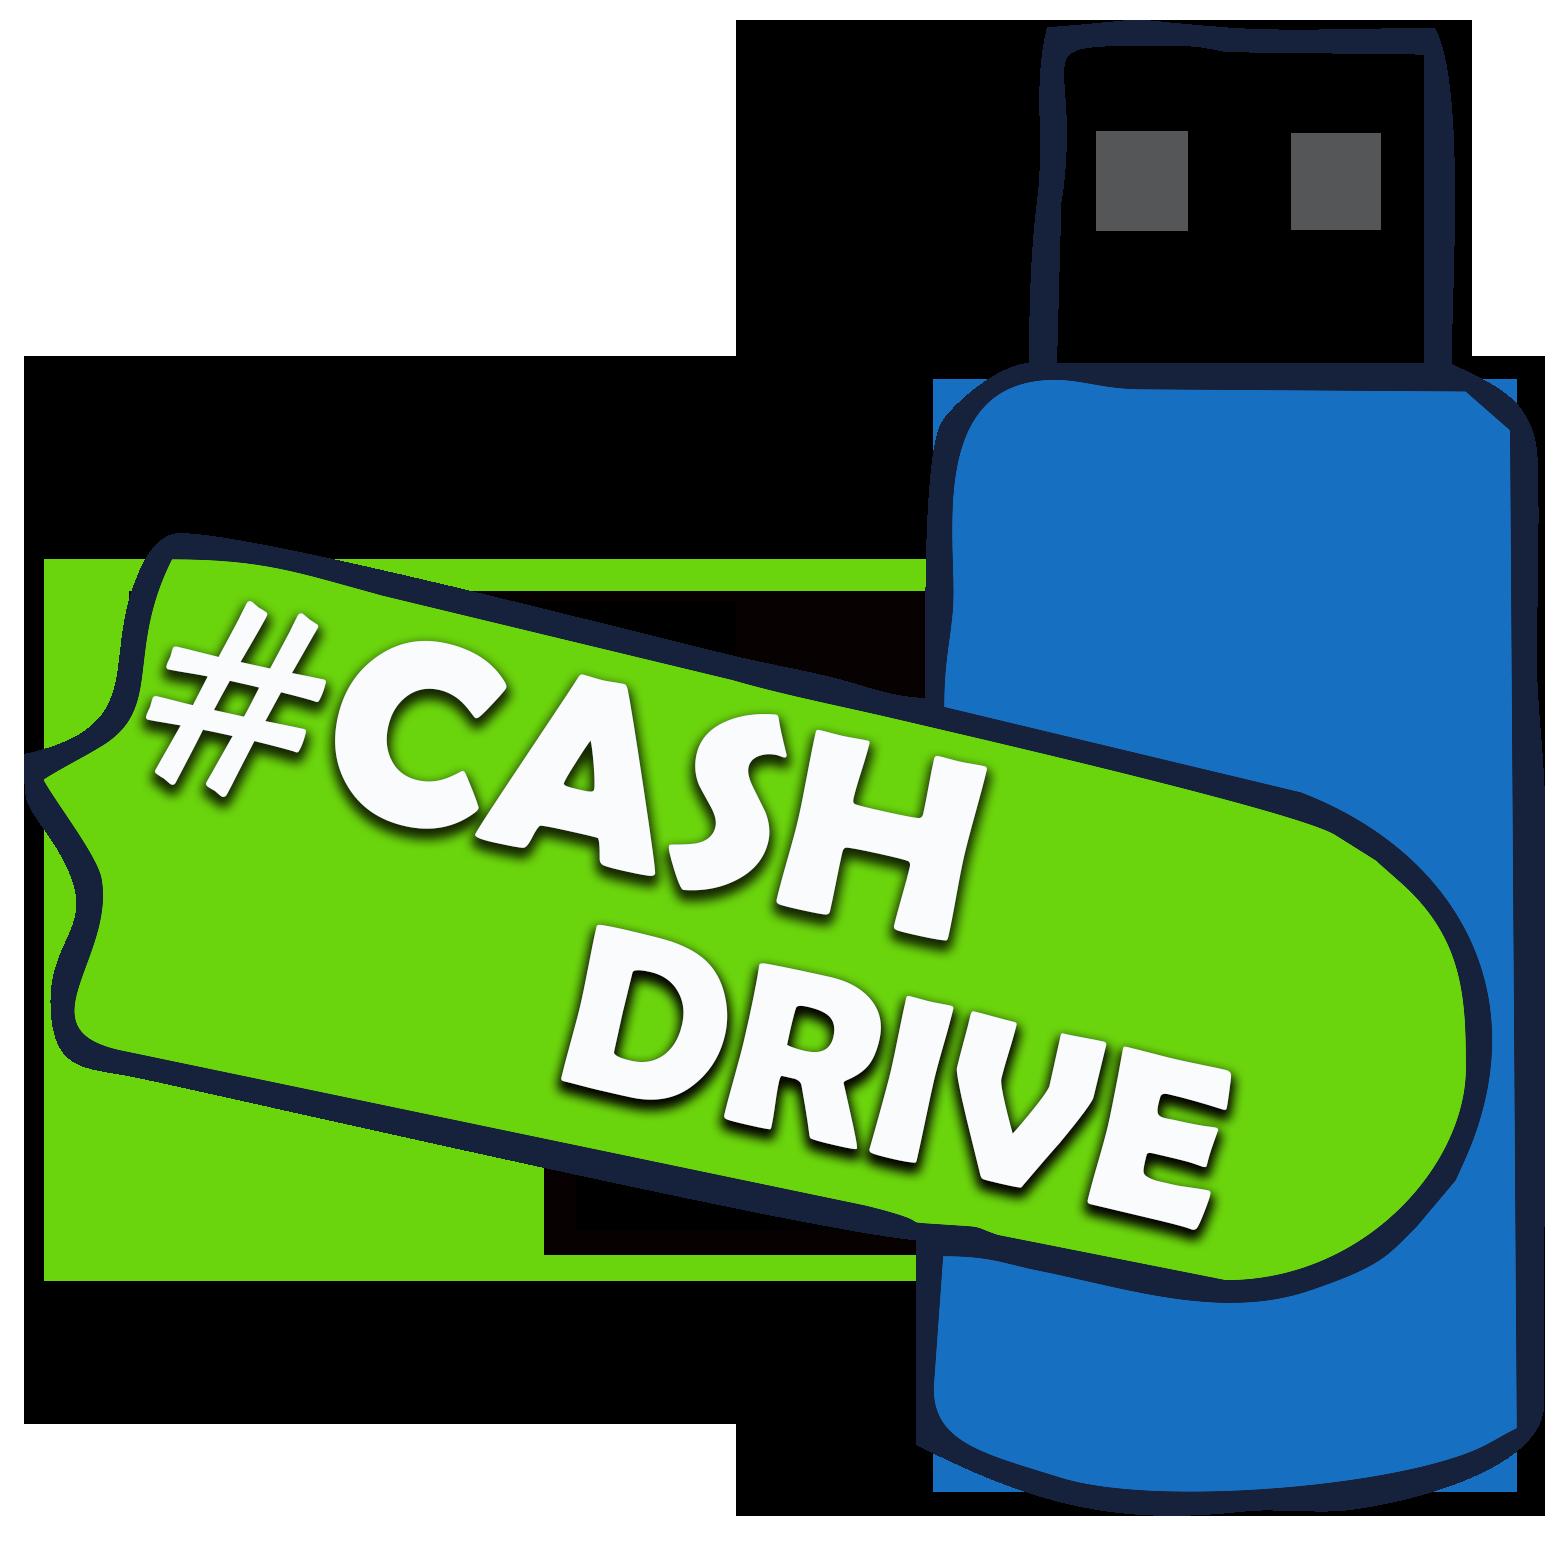 Voucher #Cashdrive - Para Empresas e Fotógrafos 8 GB